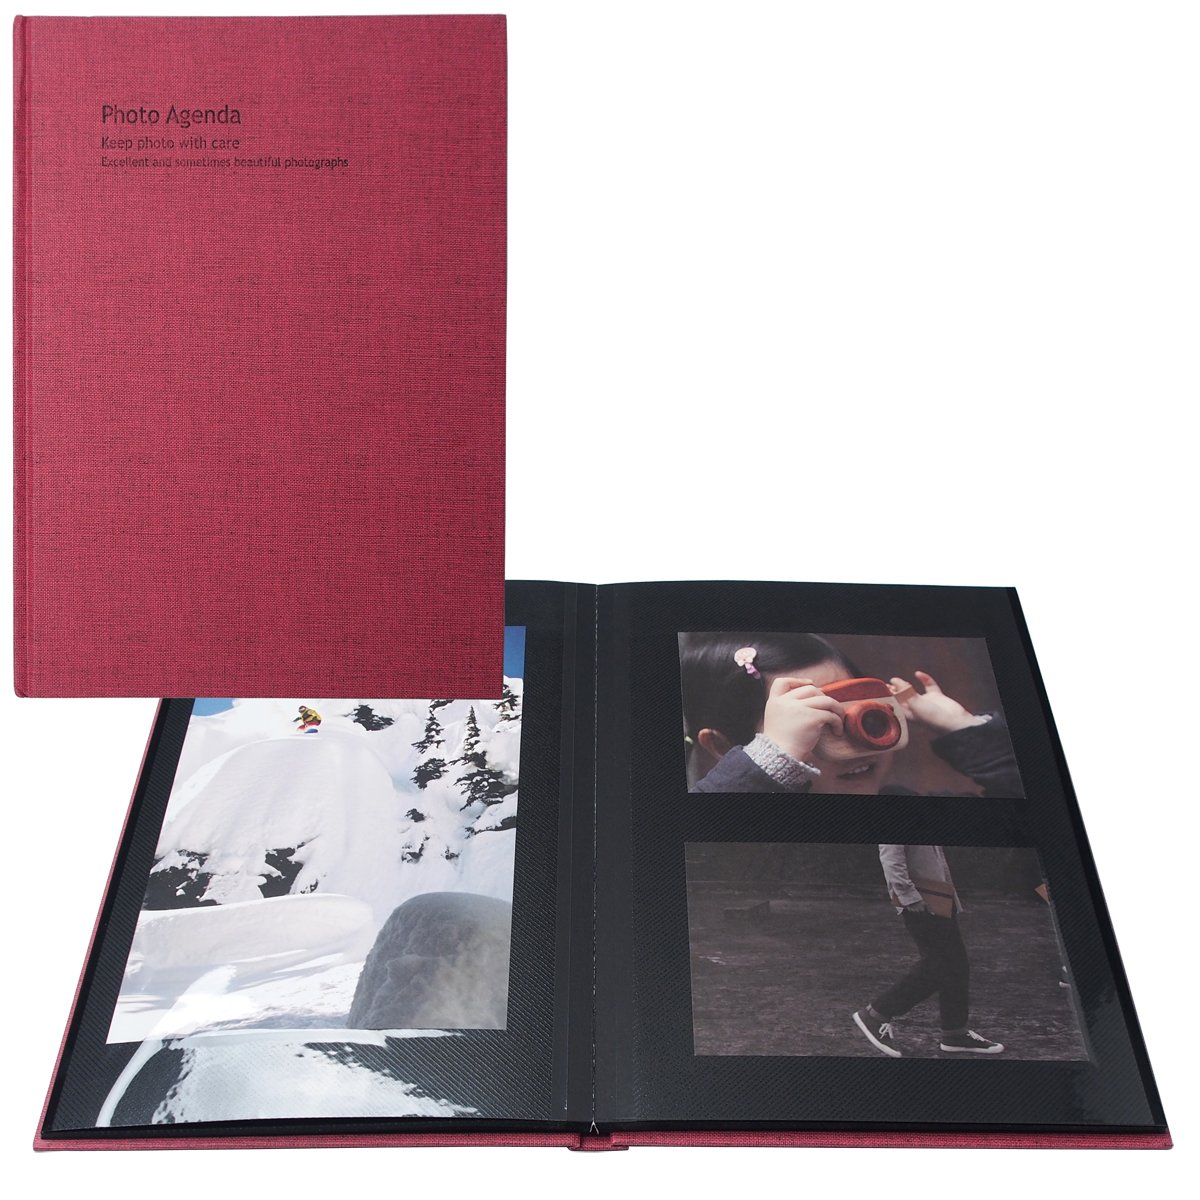 AHZOA Photo Agenda Self-adhesive Album, 40 Black Inner Pages (blue)